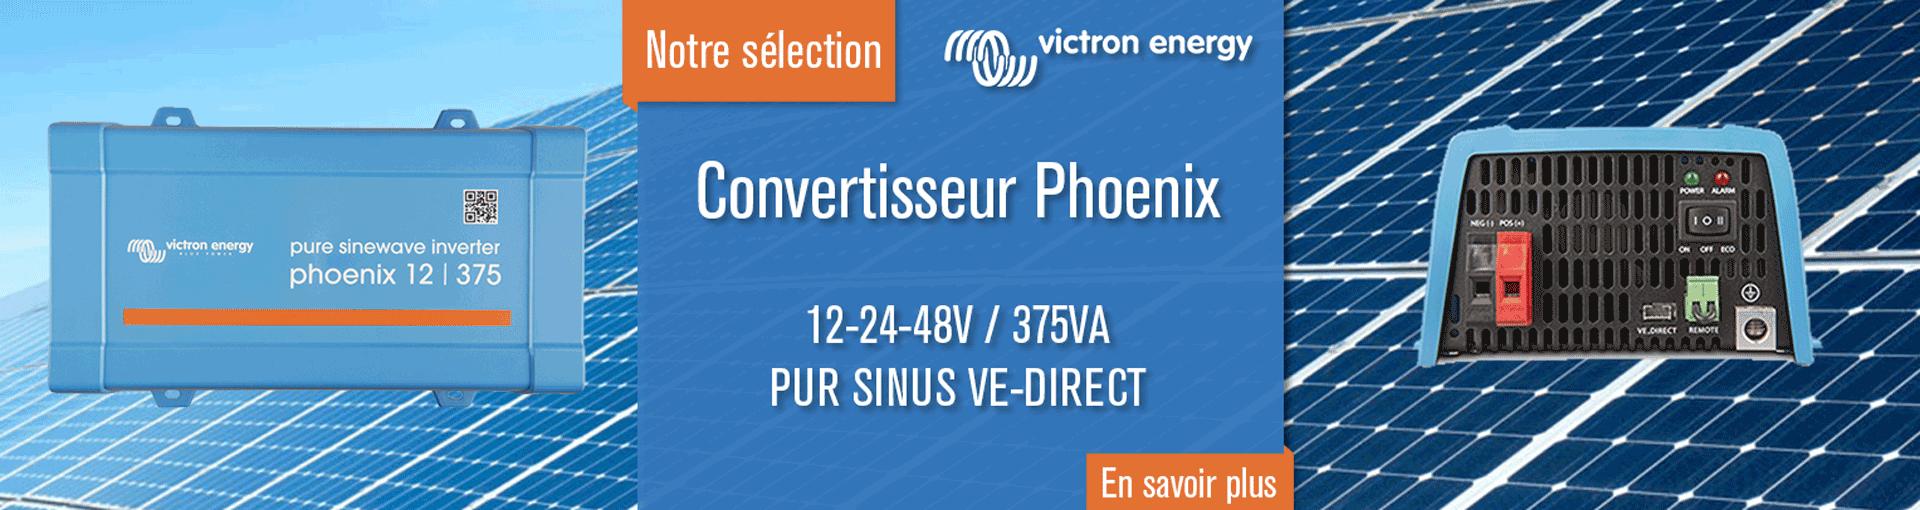 Convertisseur Phoenix 12V 375VA - Victron Energy